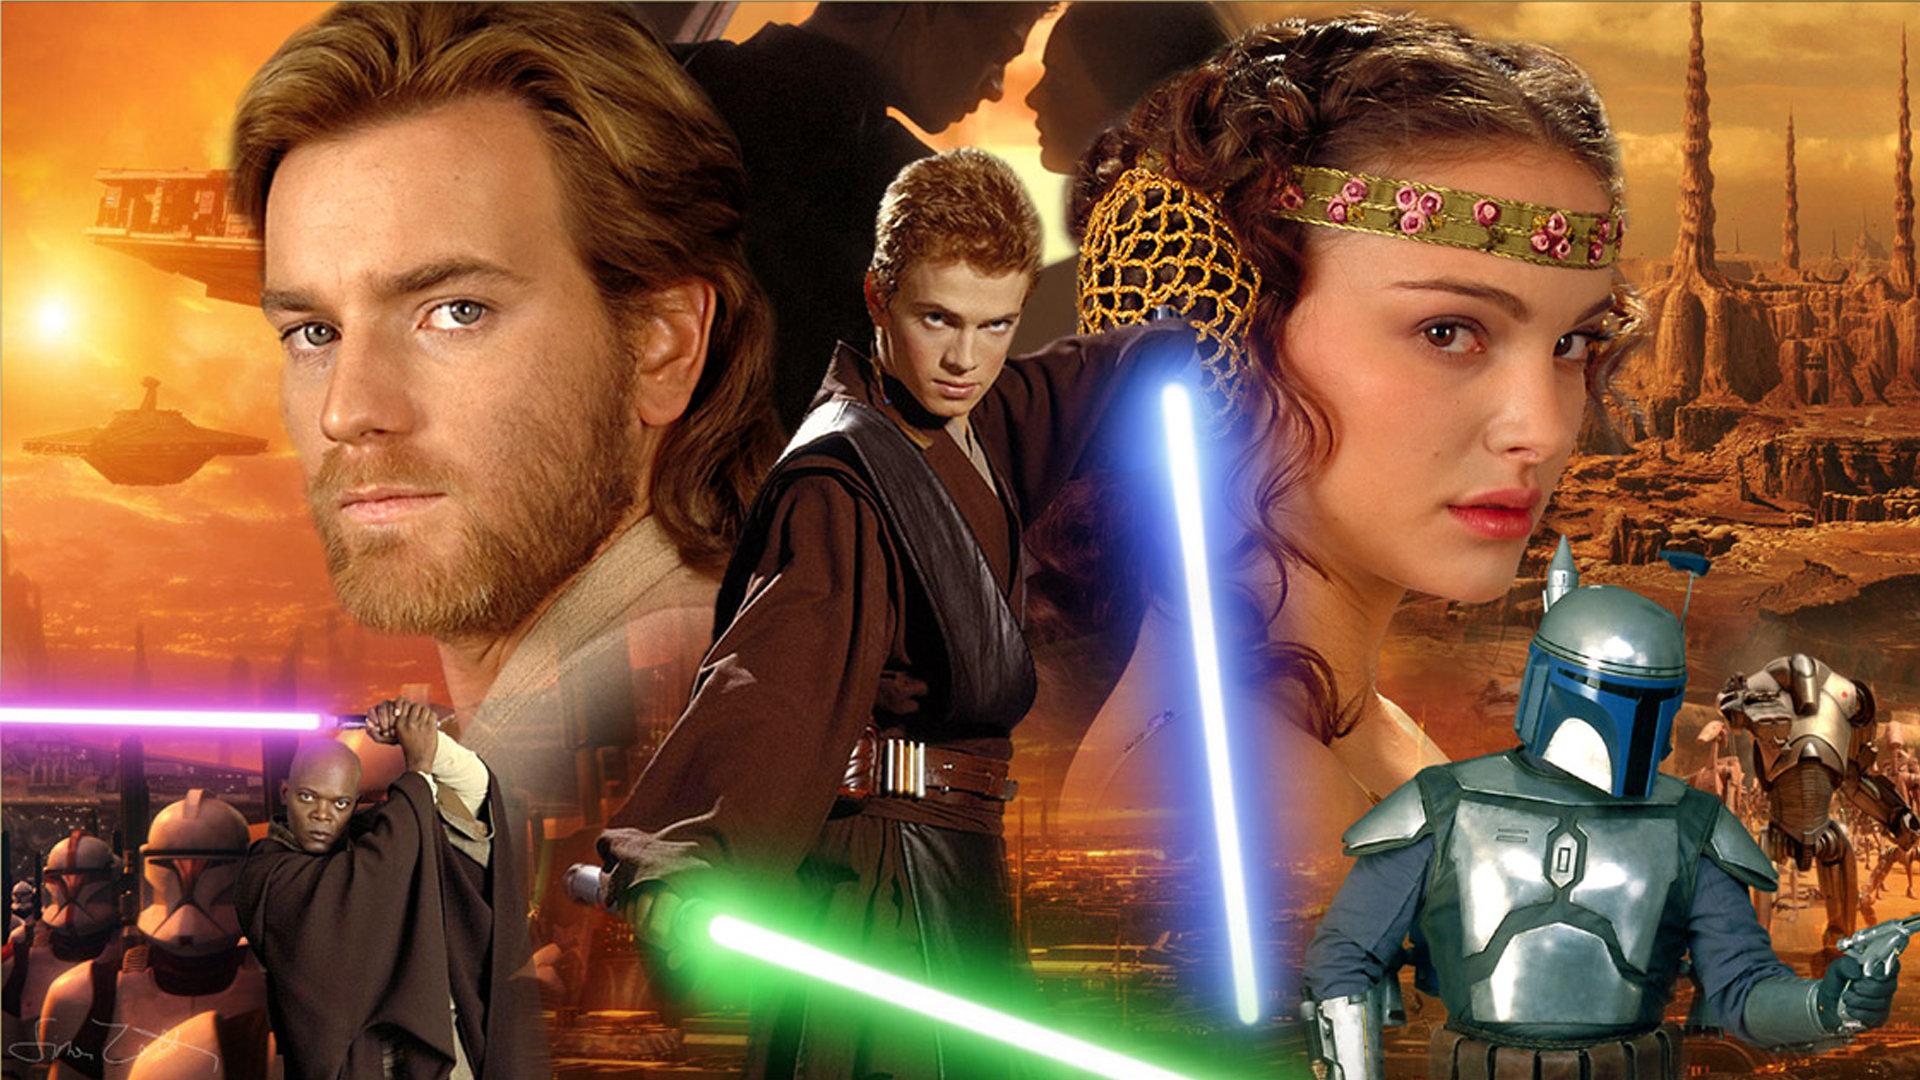 star wars episode 2 full movie videobash